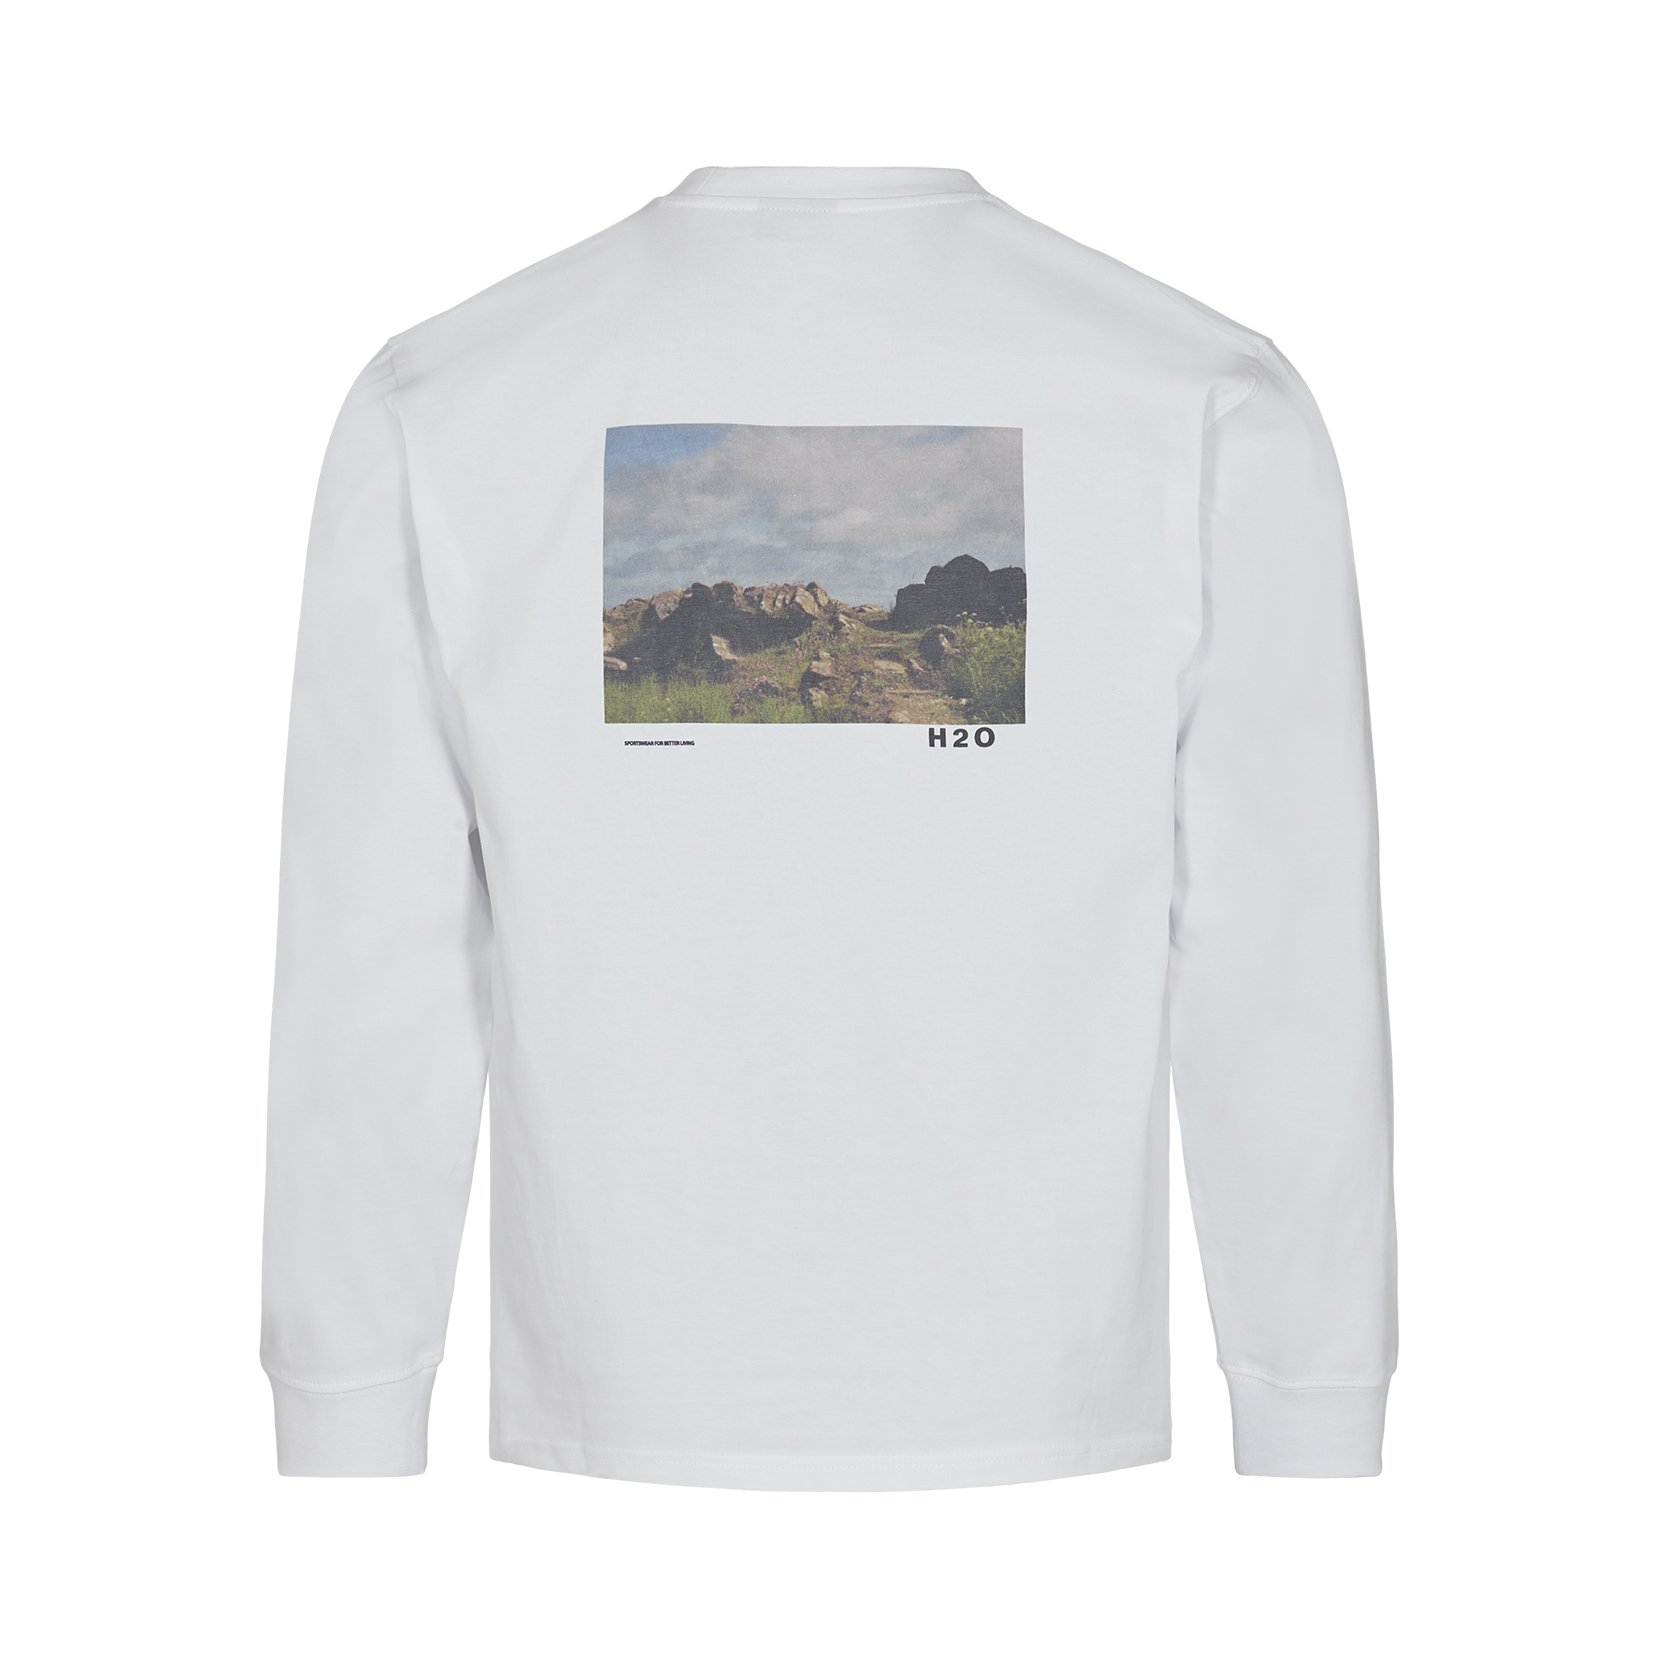 H2O Lilleø LS t-shirt, white, xx-large